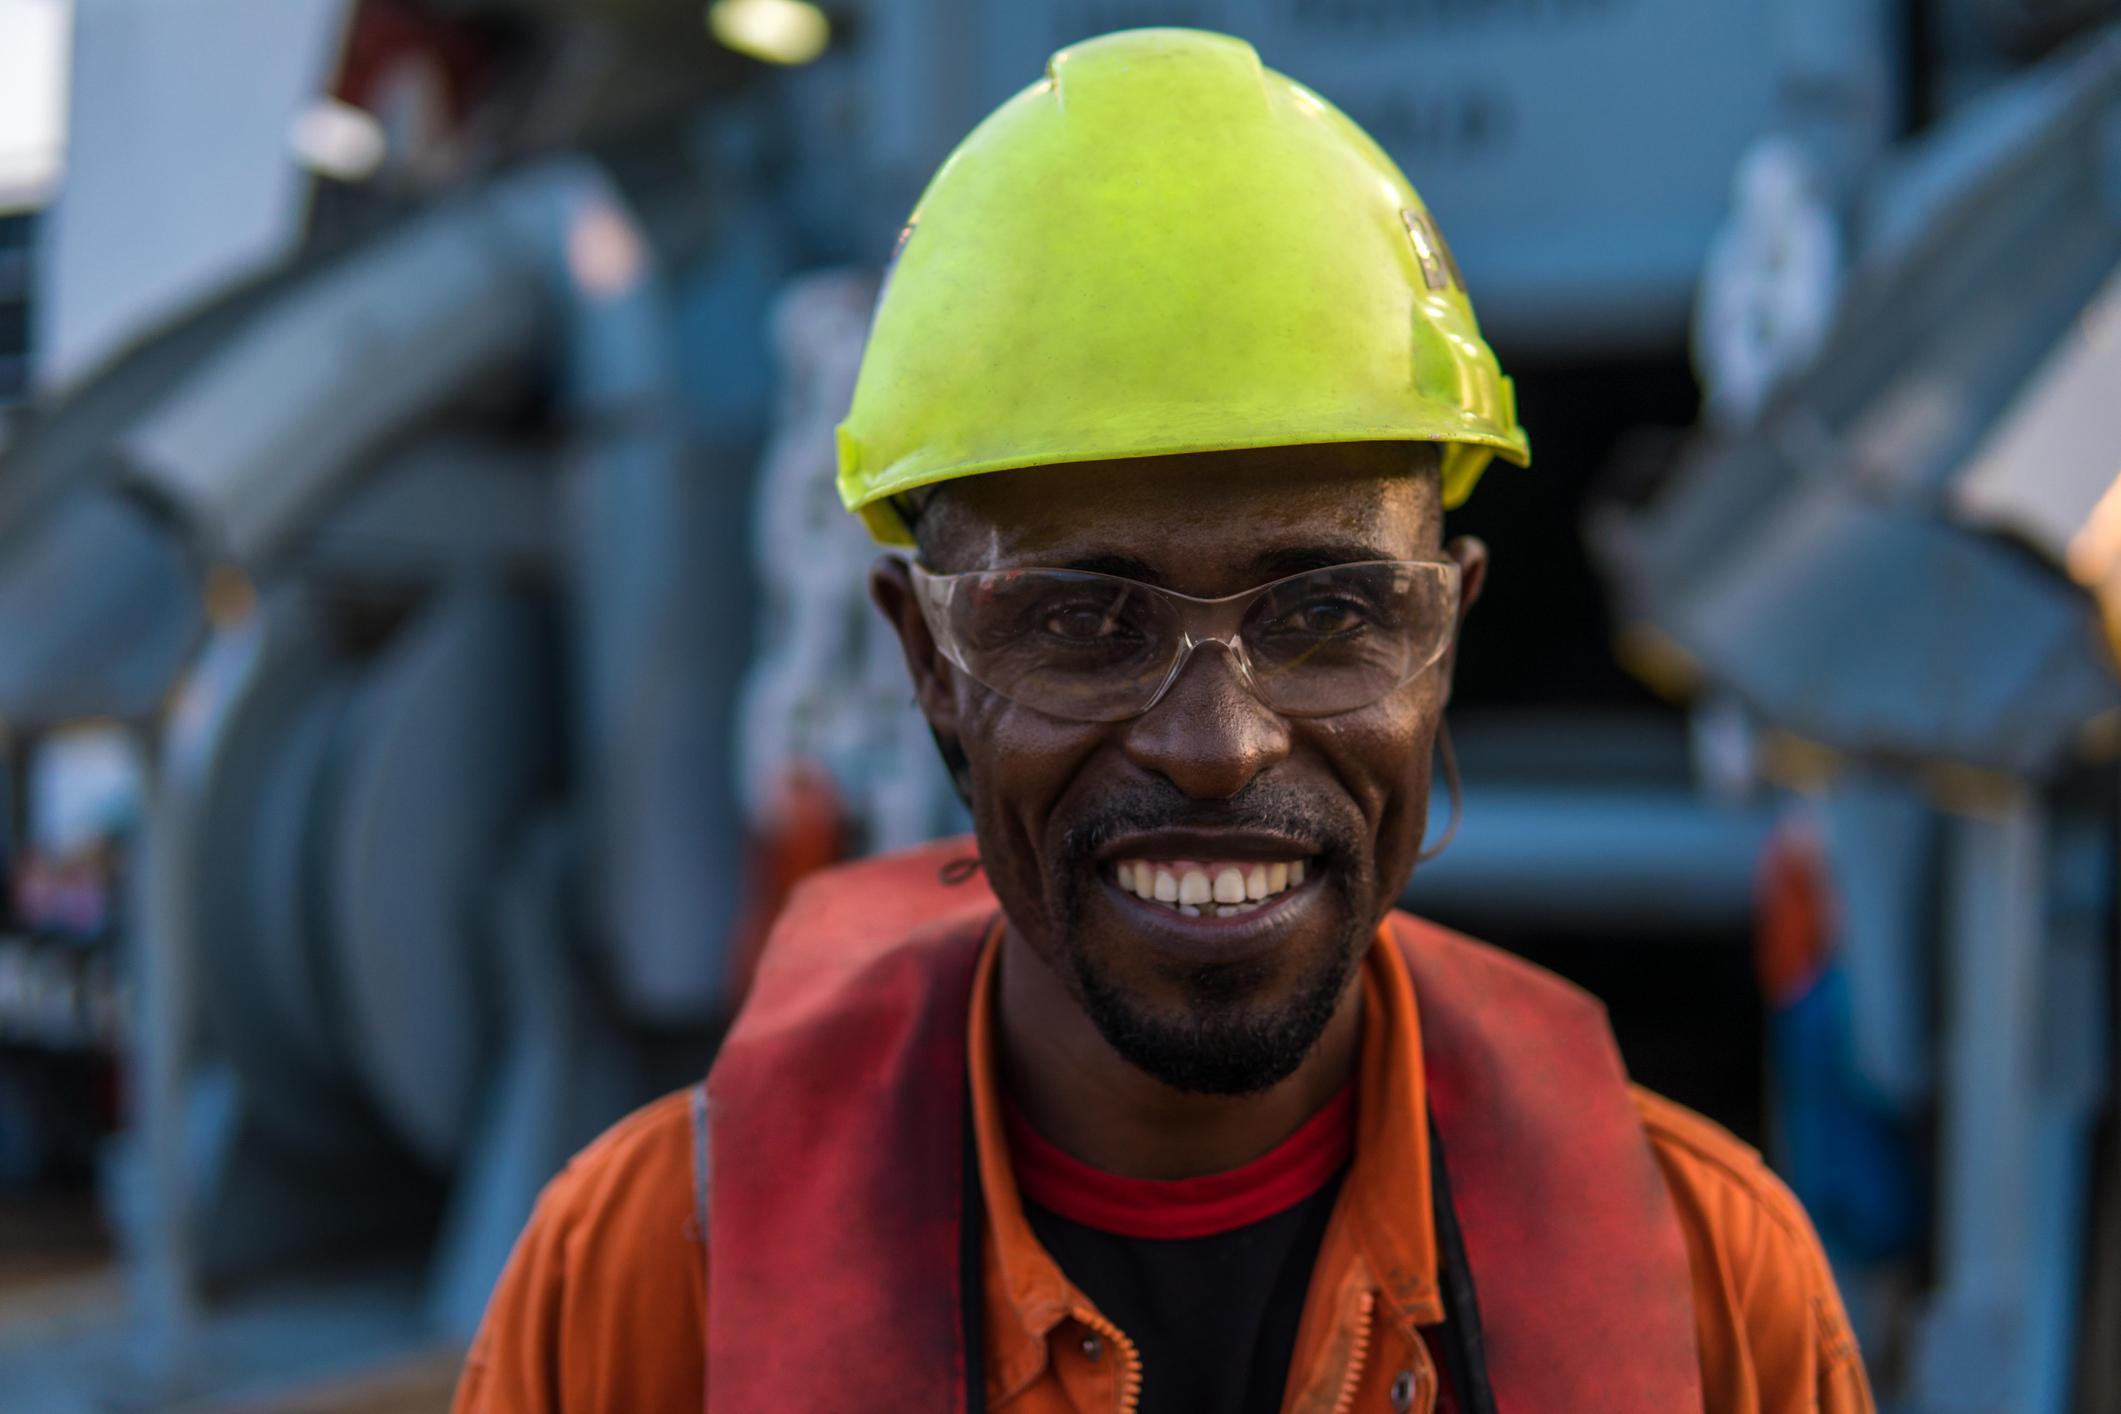 Seafarer smiling